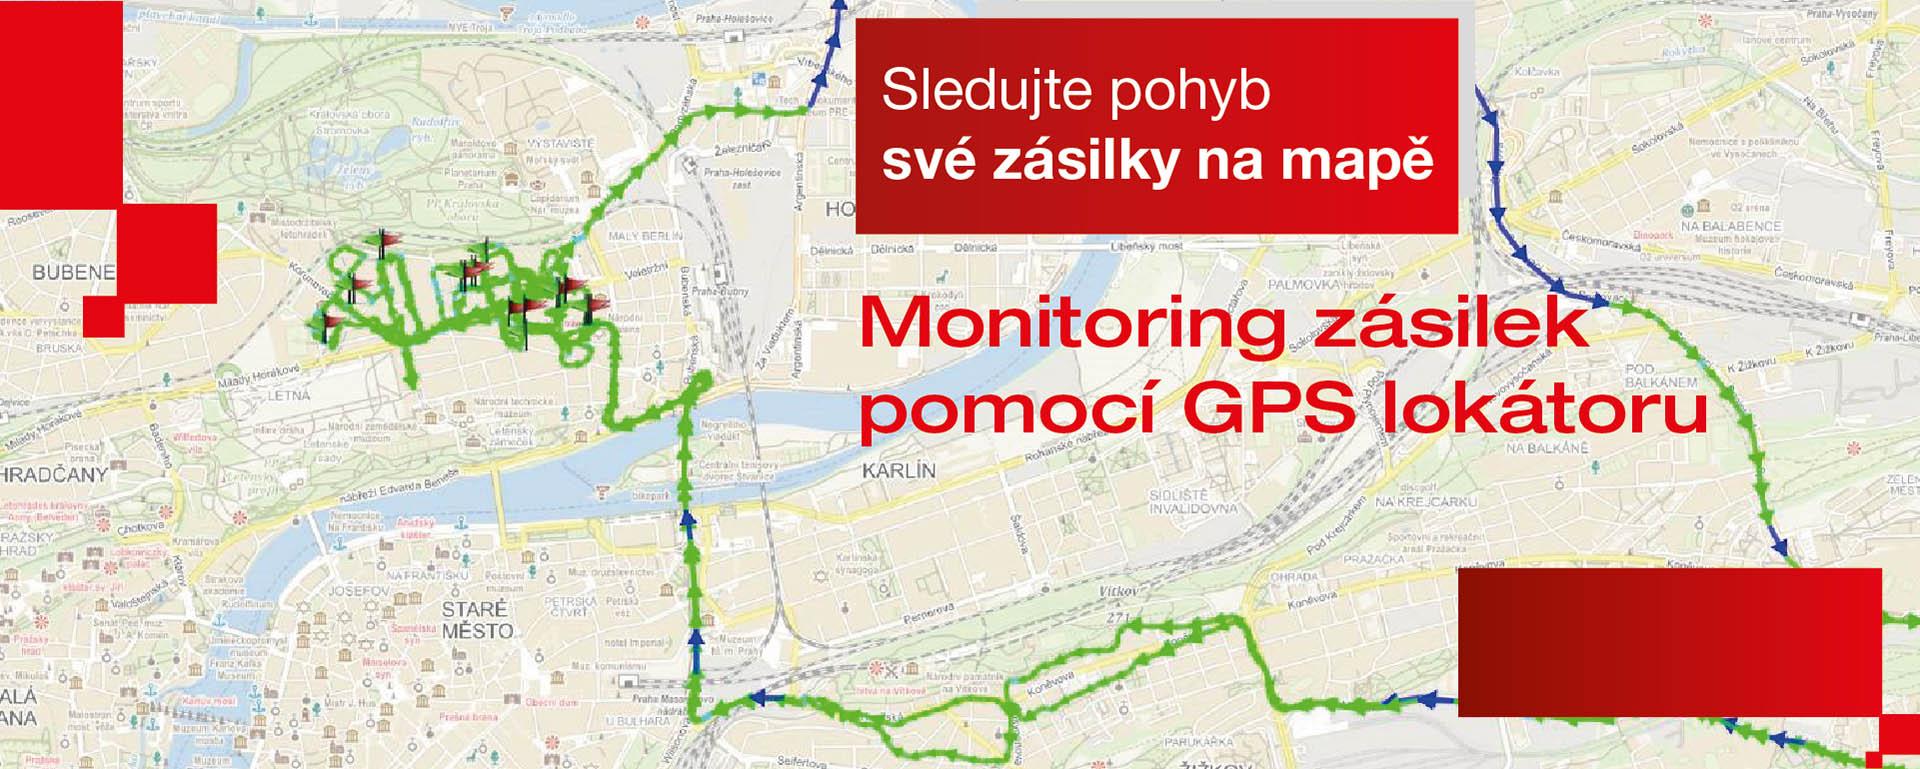 Monitoring zásilek